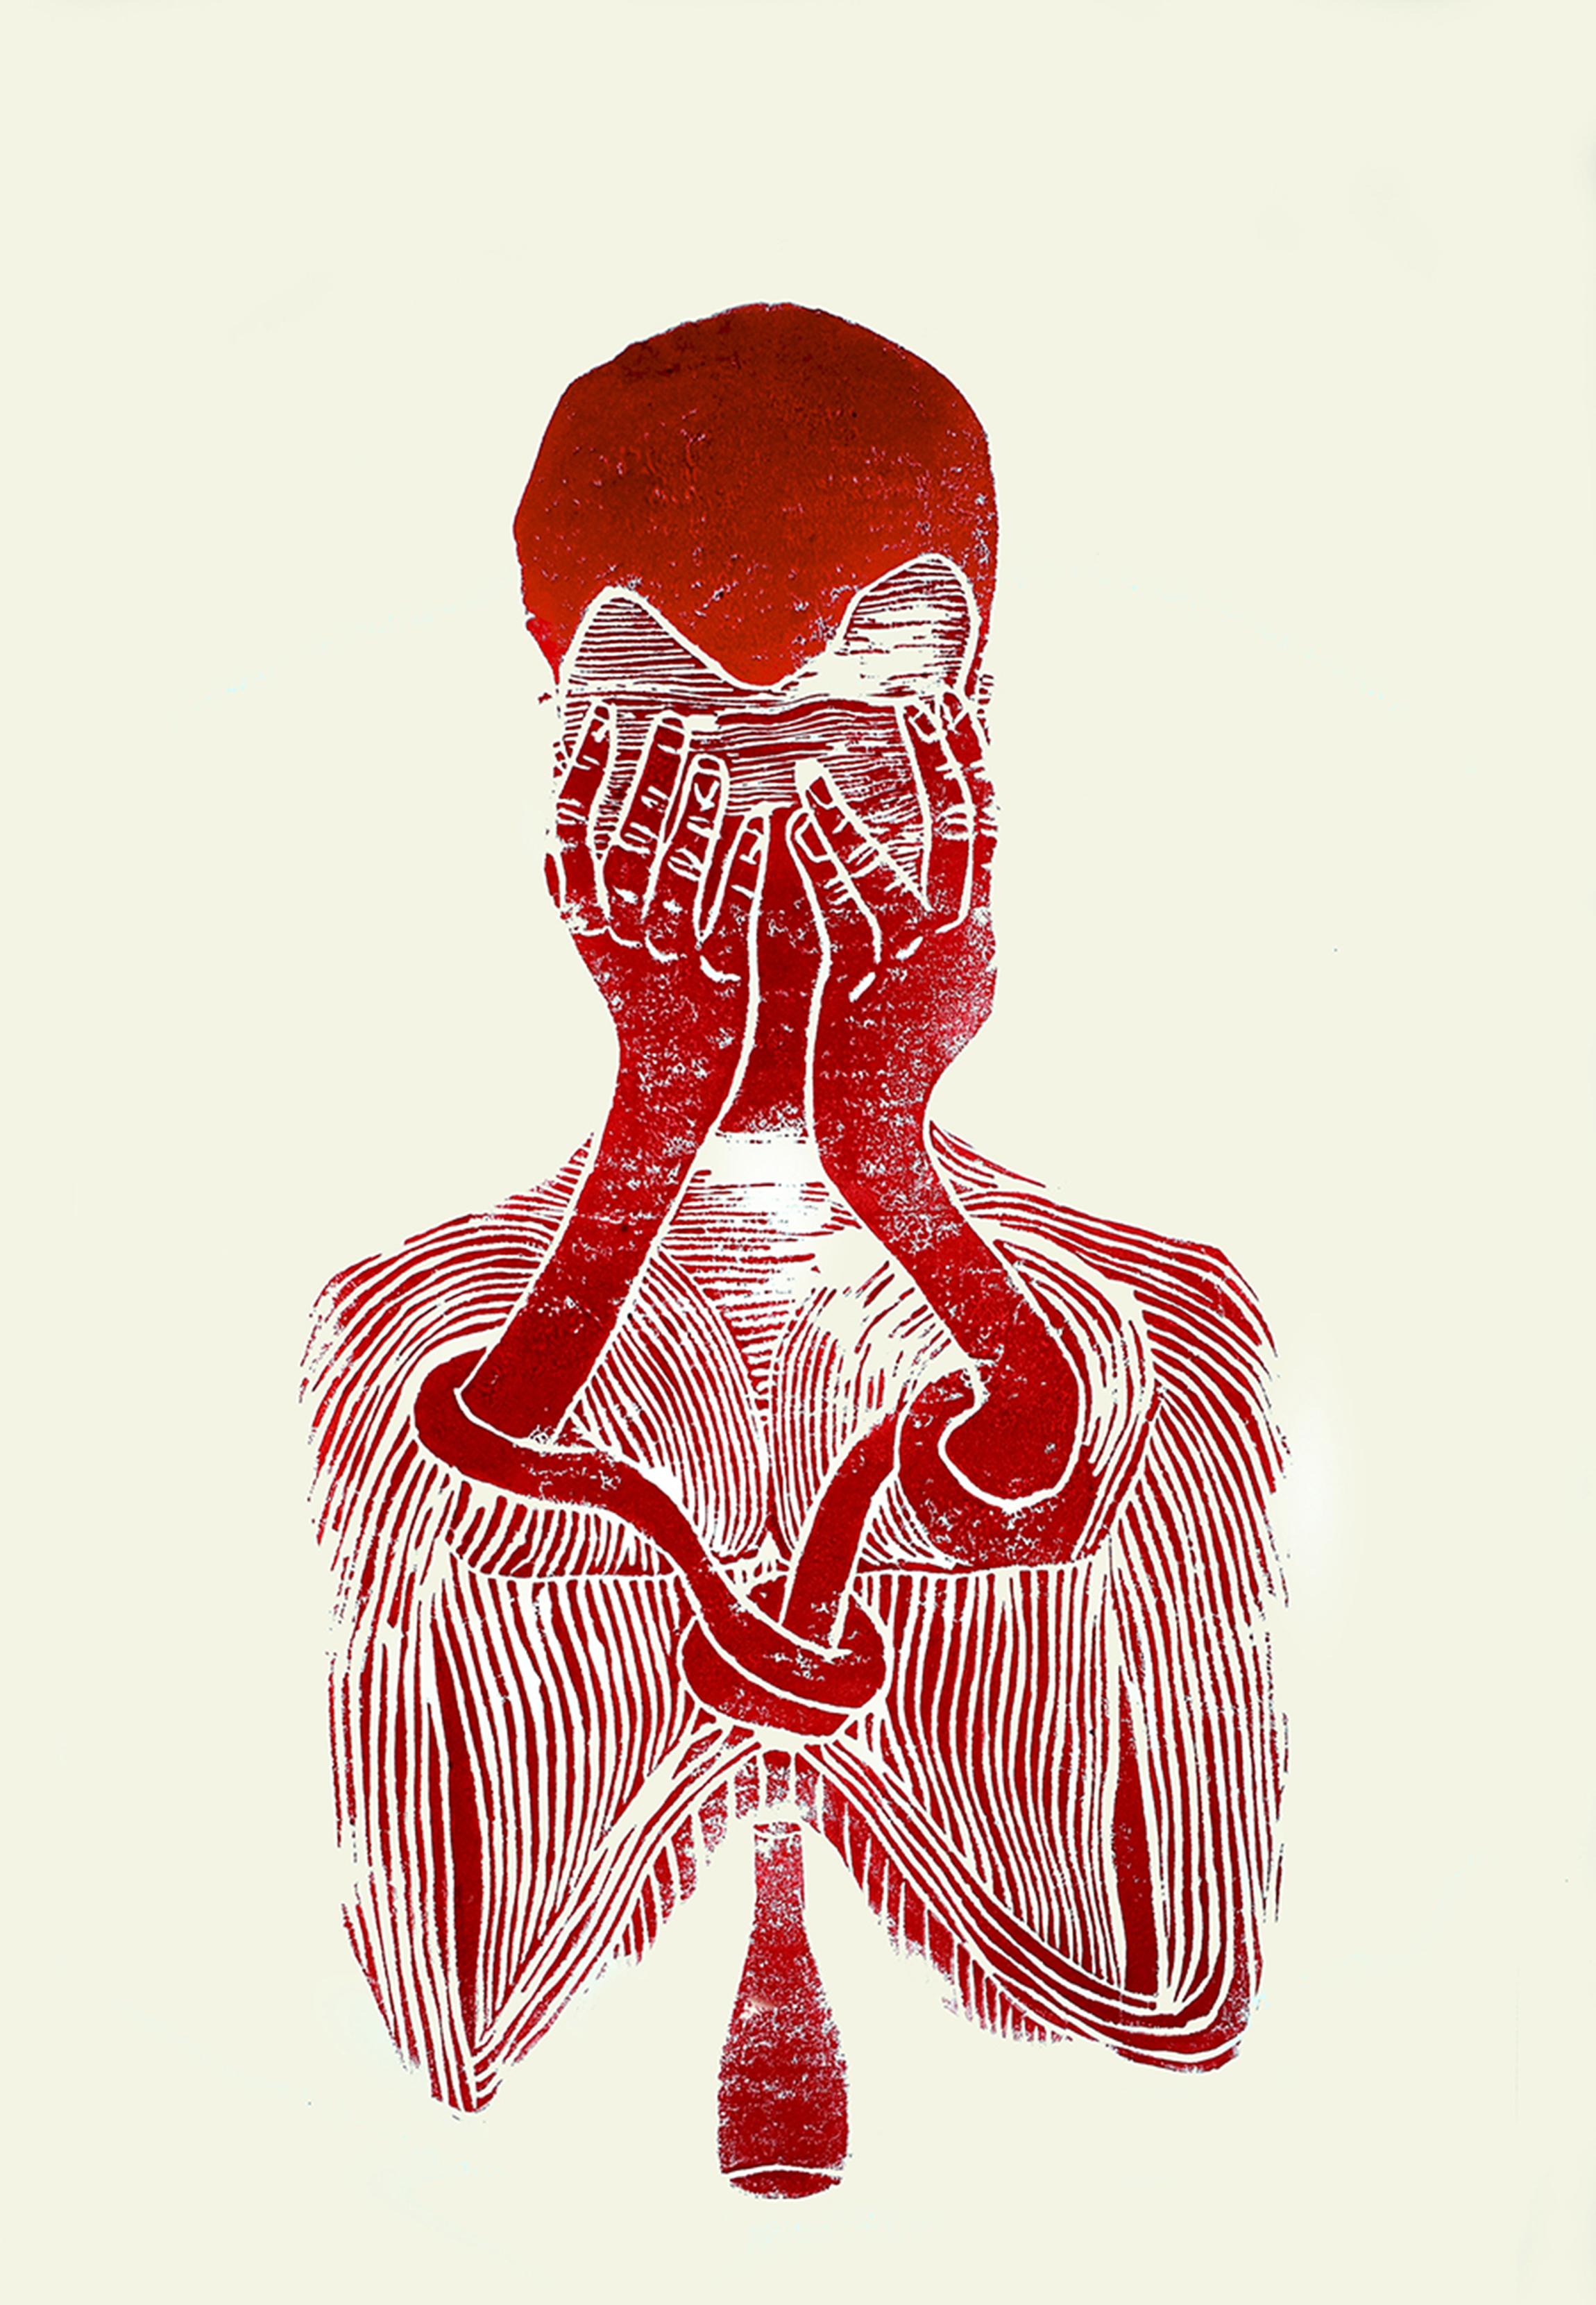 'The soul as an alcoholic', linocut print on paper,  42cm x 59.4cm, 2017